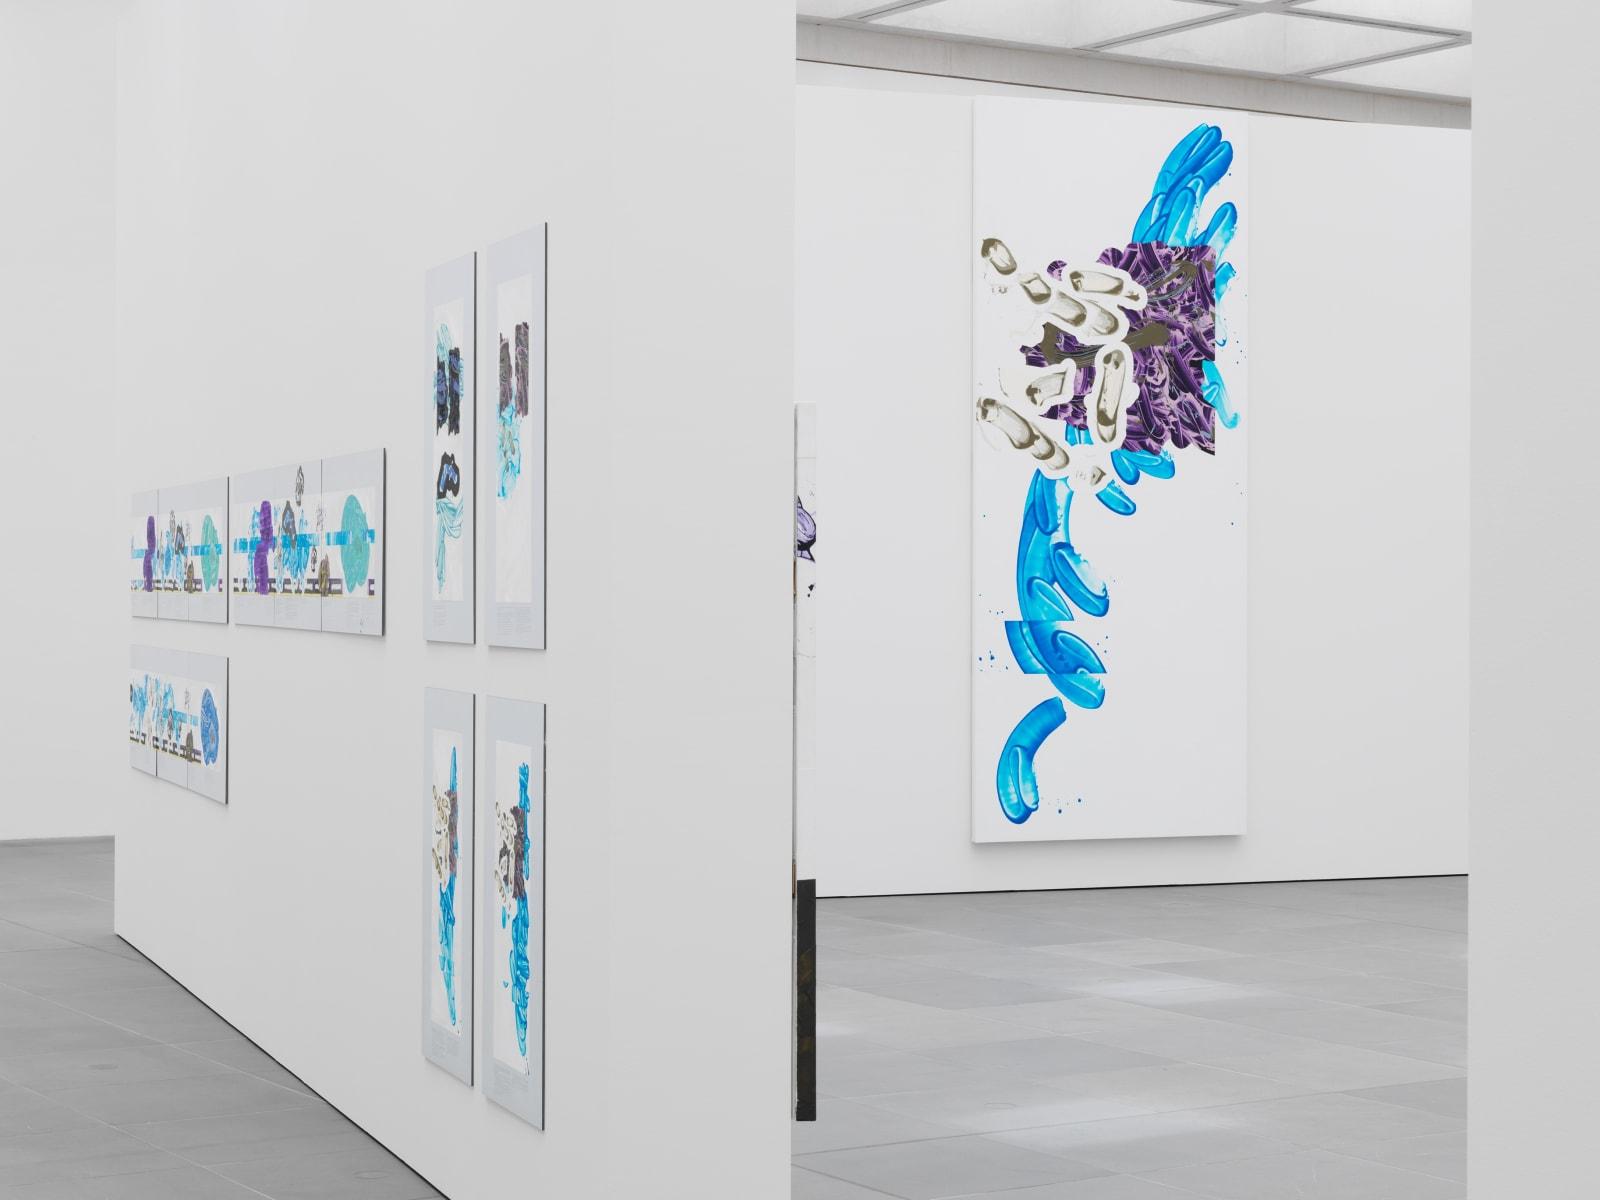 Ausstellungsansicht Vice and Reflection #2, Neues Museum Nürnberg, 2019, Courtesy of Häusler Contemporary | Photo: NMN (Annette Kadisch)